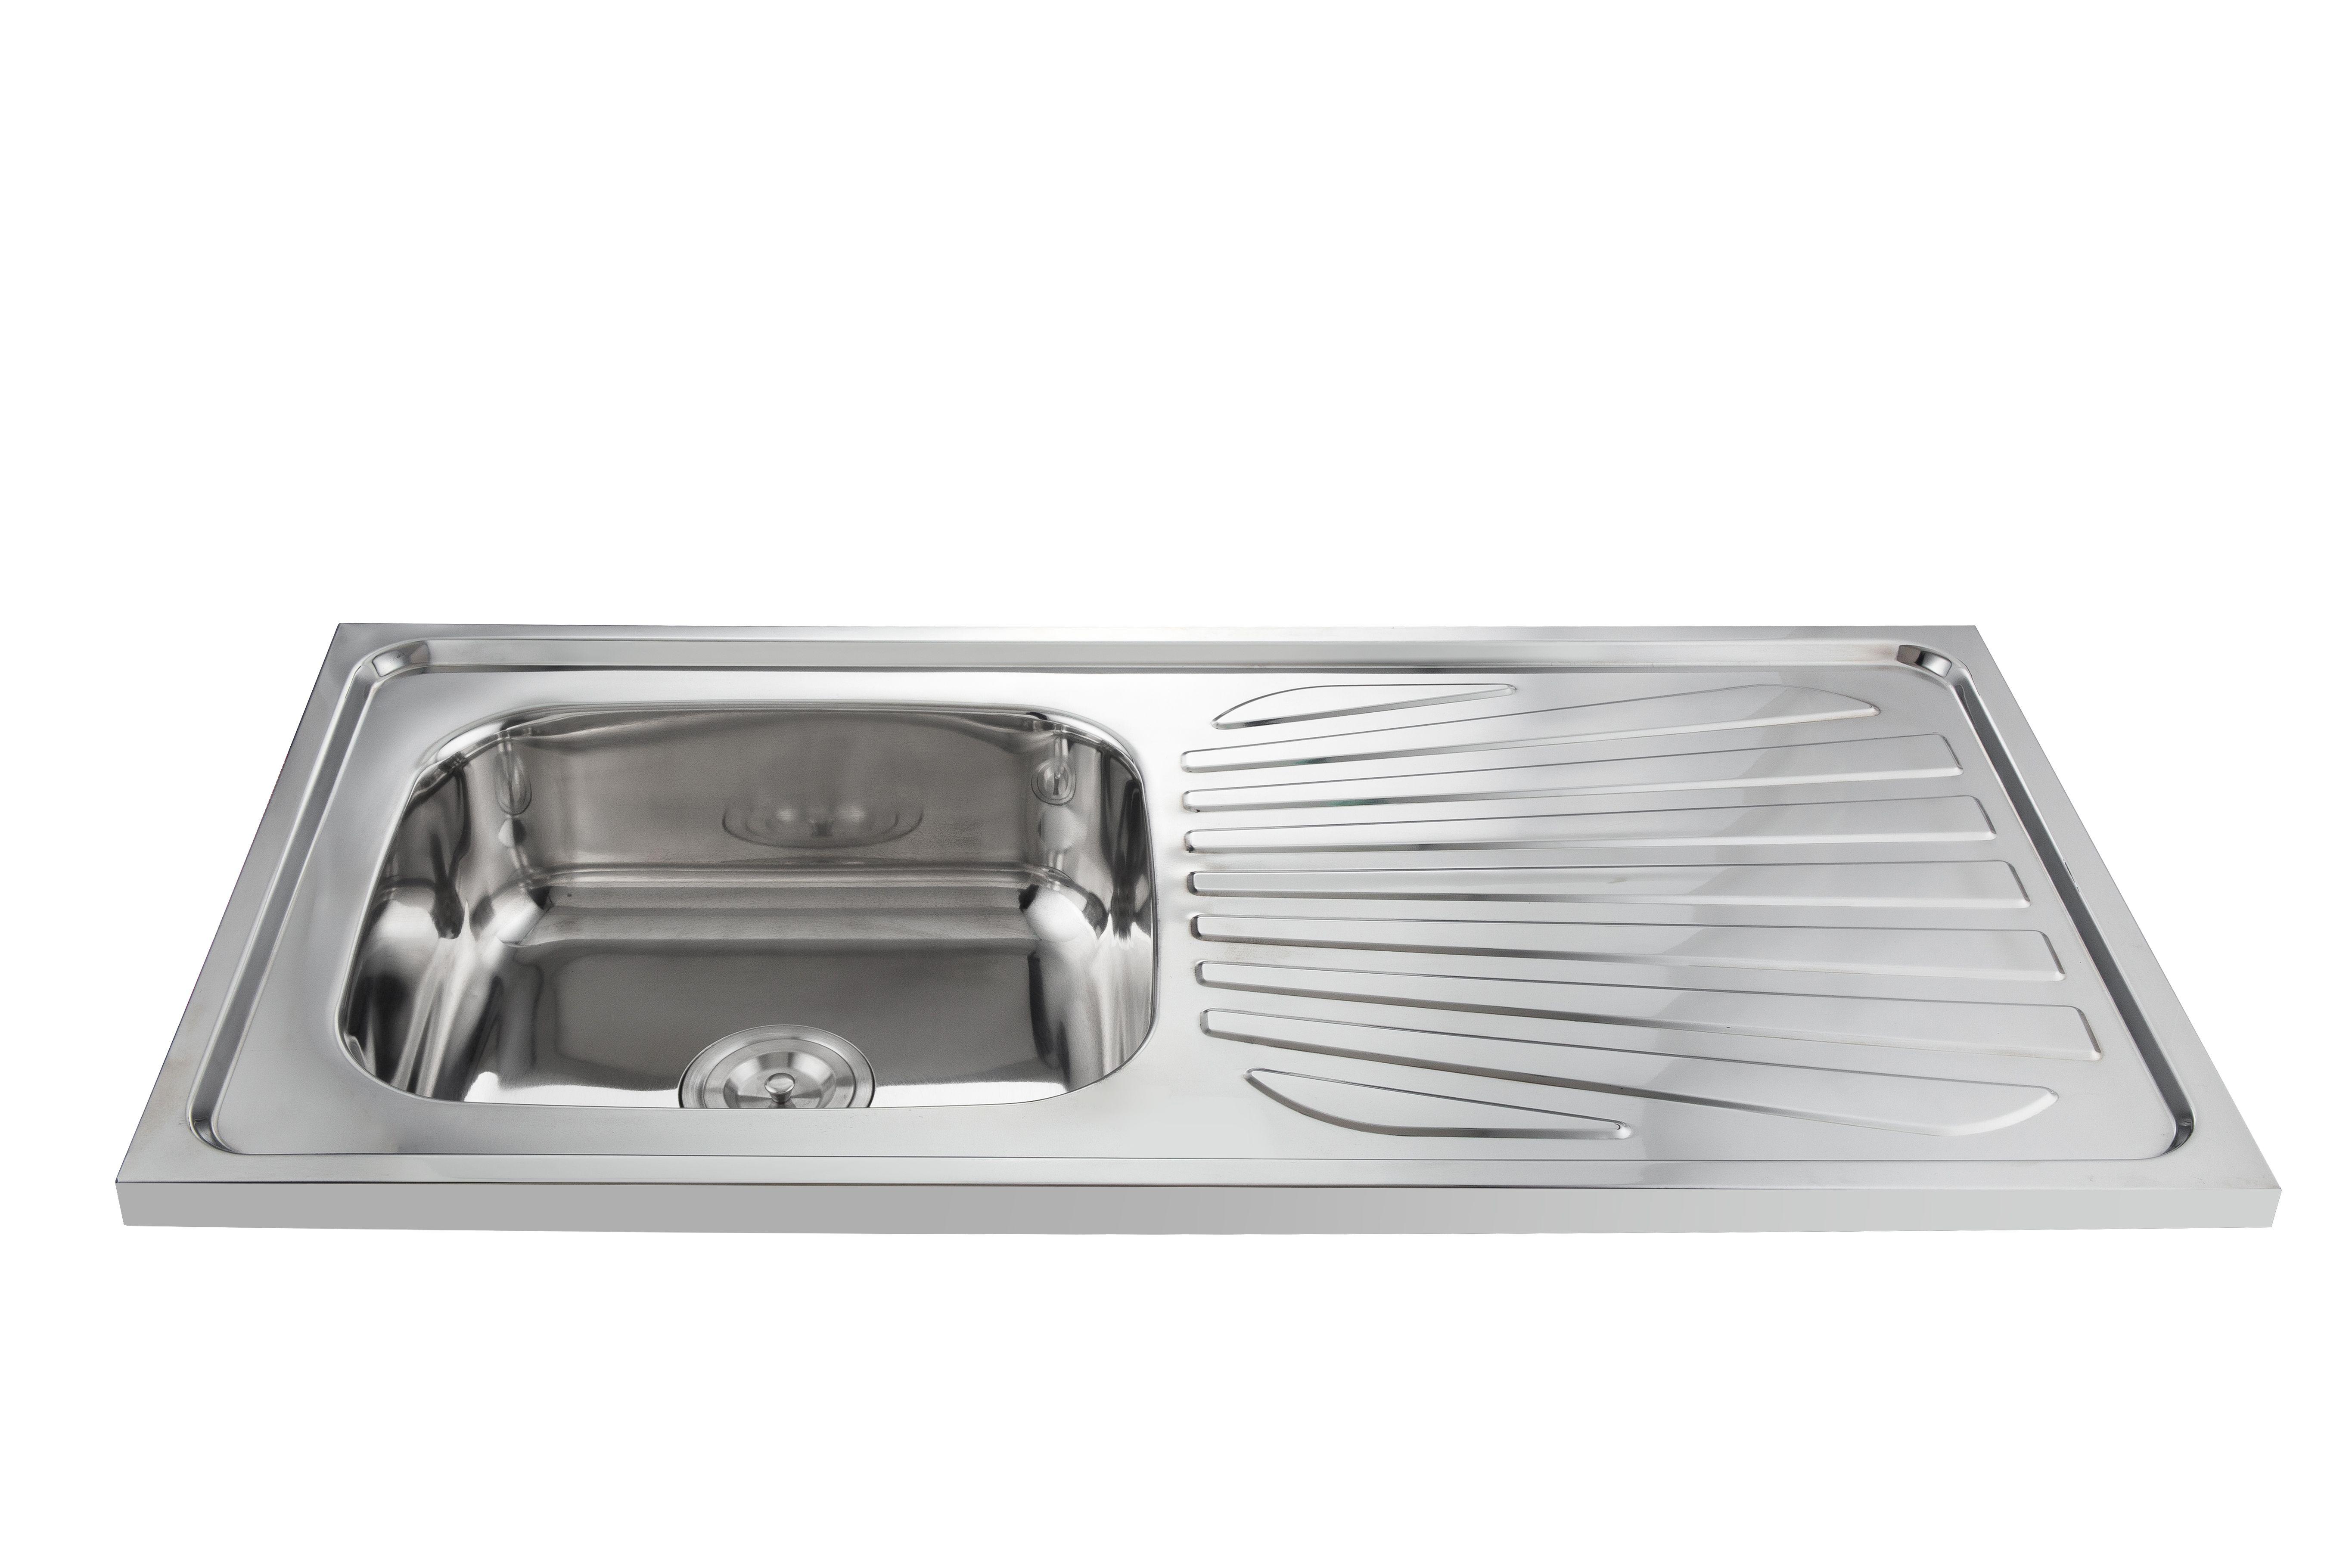 Sink Factory/Sink Manufacturer/Stainless steel sink/kitche ...